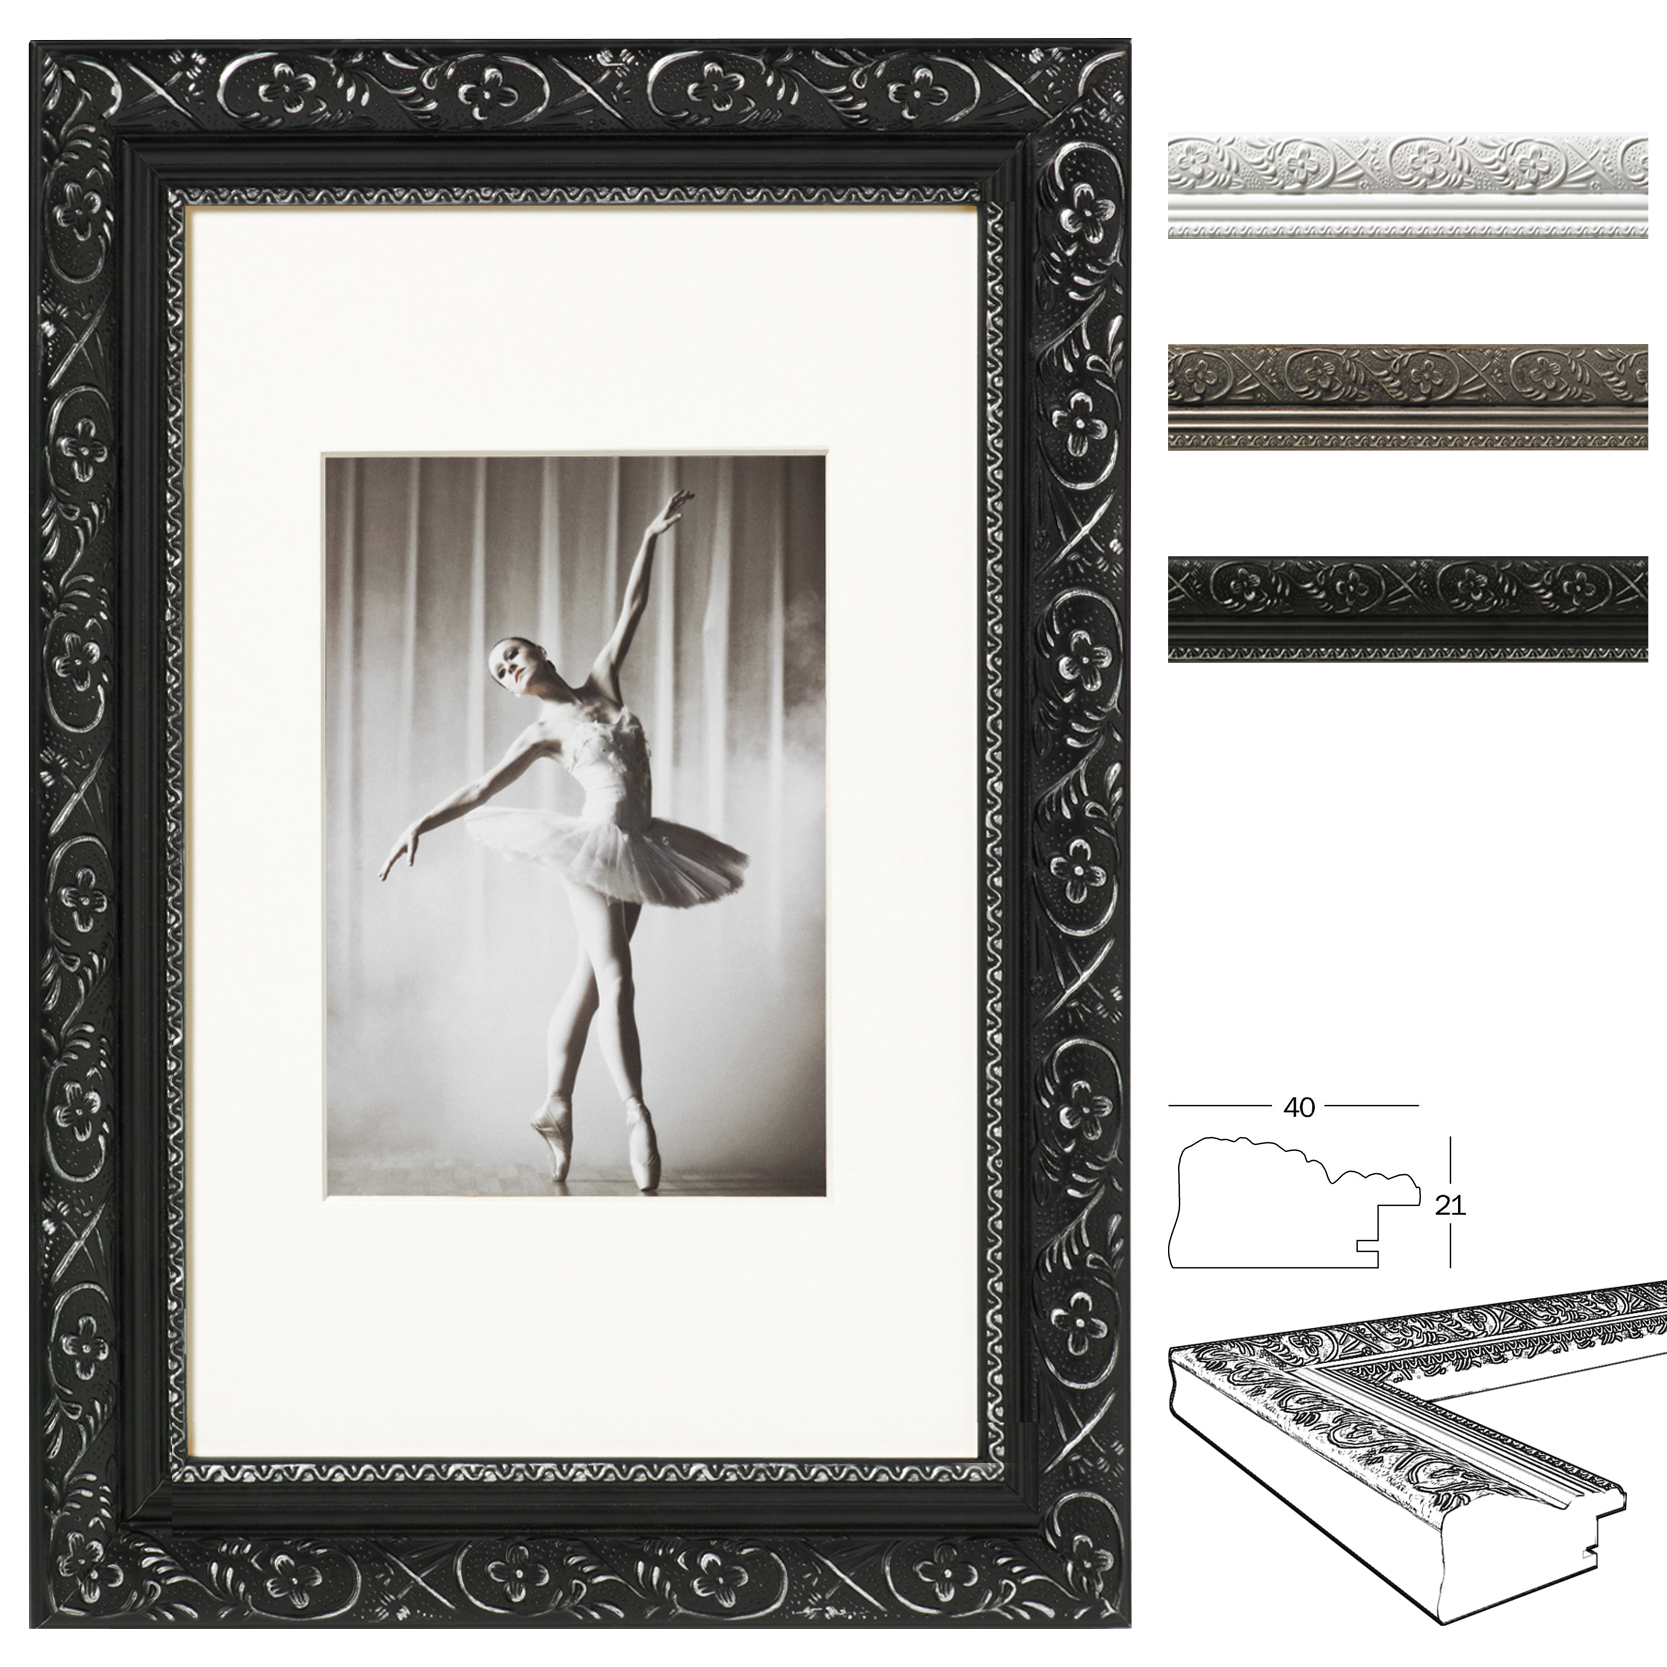 bilderrahmen fotogalerie bildergalerie collage galerie antik barock holz 317 ebay. Black Bedroom Furniture Sets. Home Design Ideas